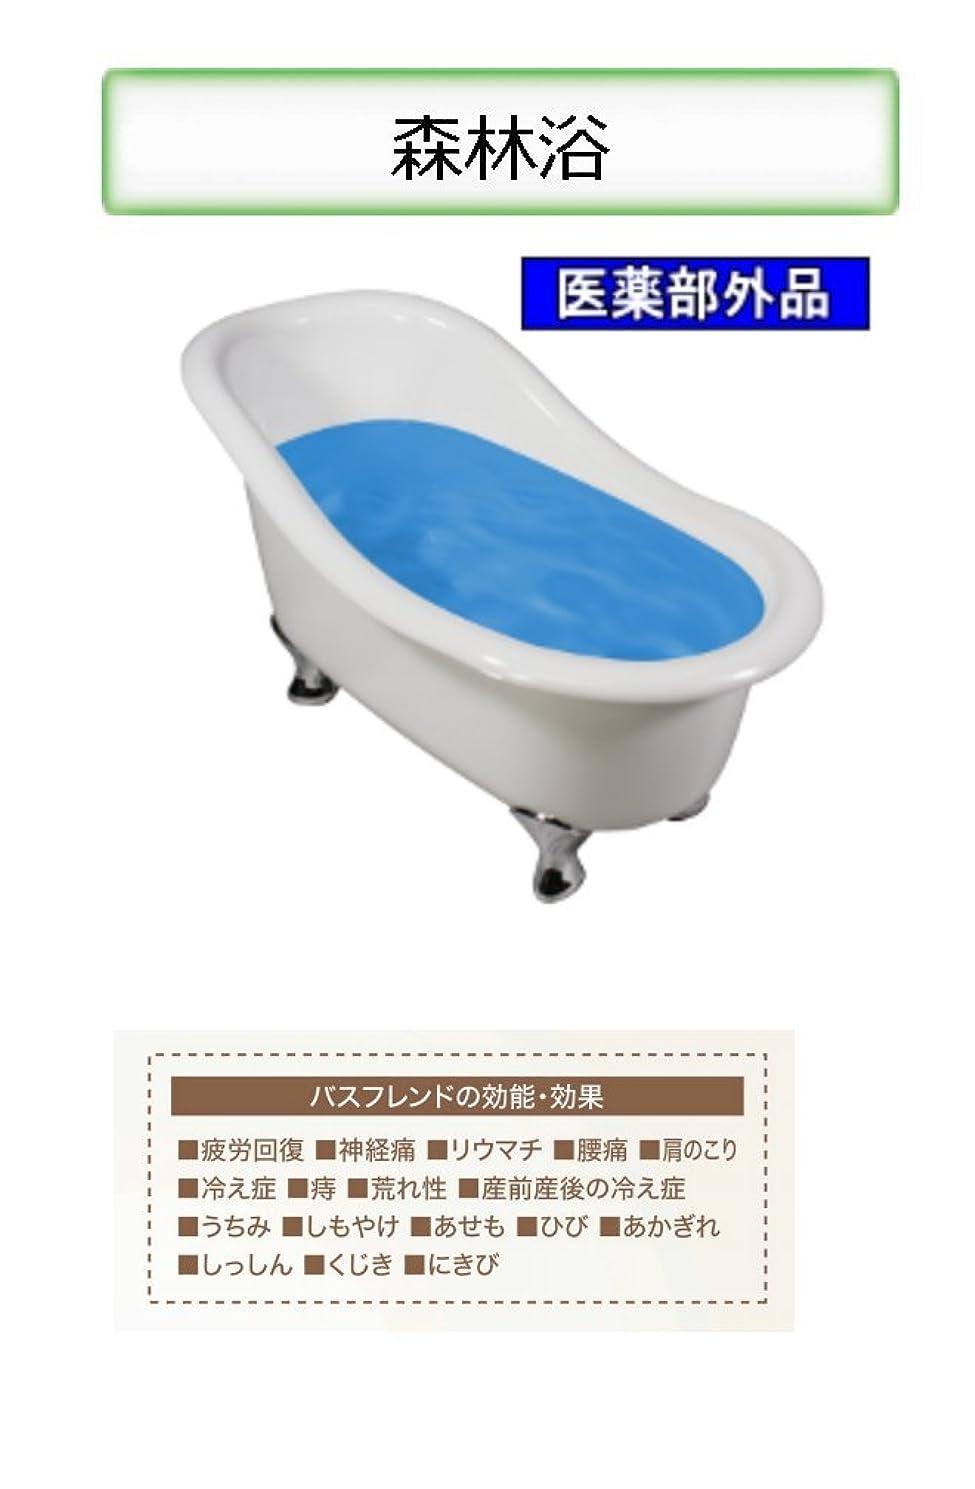 偏見普遍的な剛性薬用入浴剤 バスフレンド/伊吹正 (森林浴, 17kg)